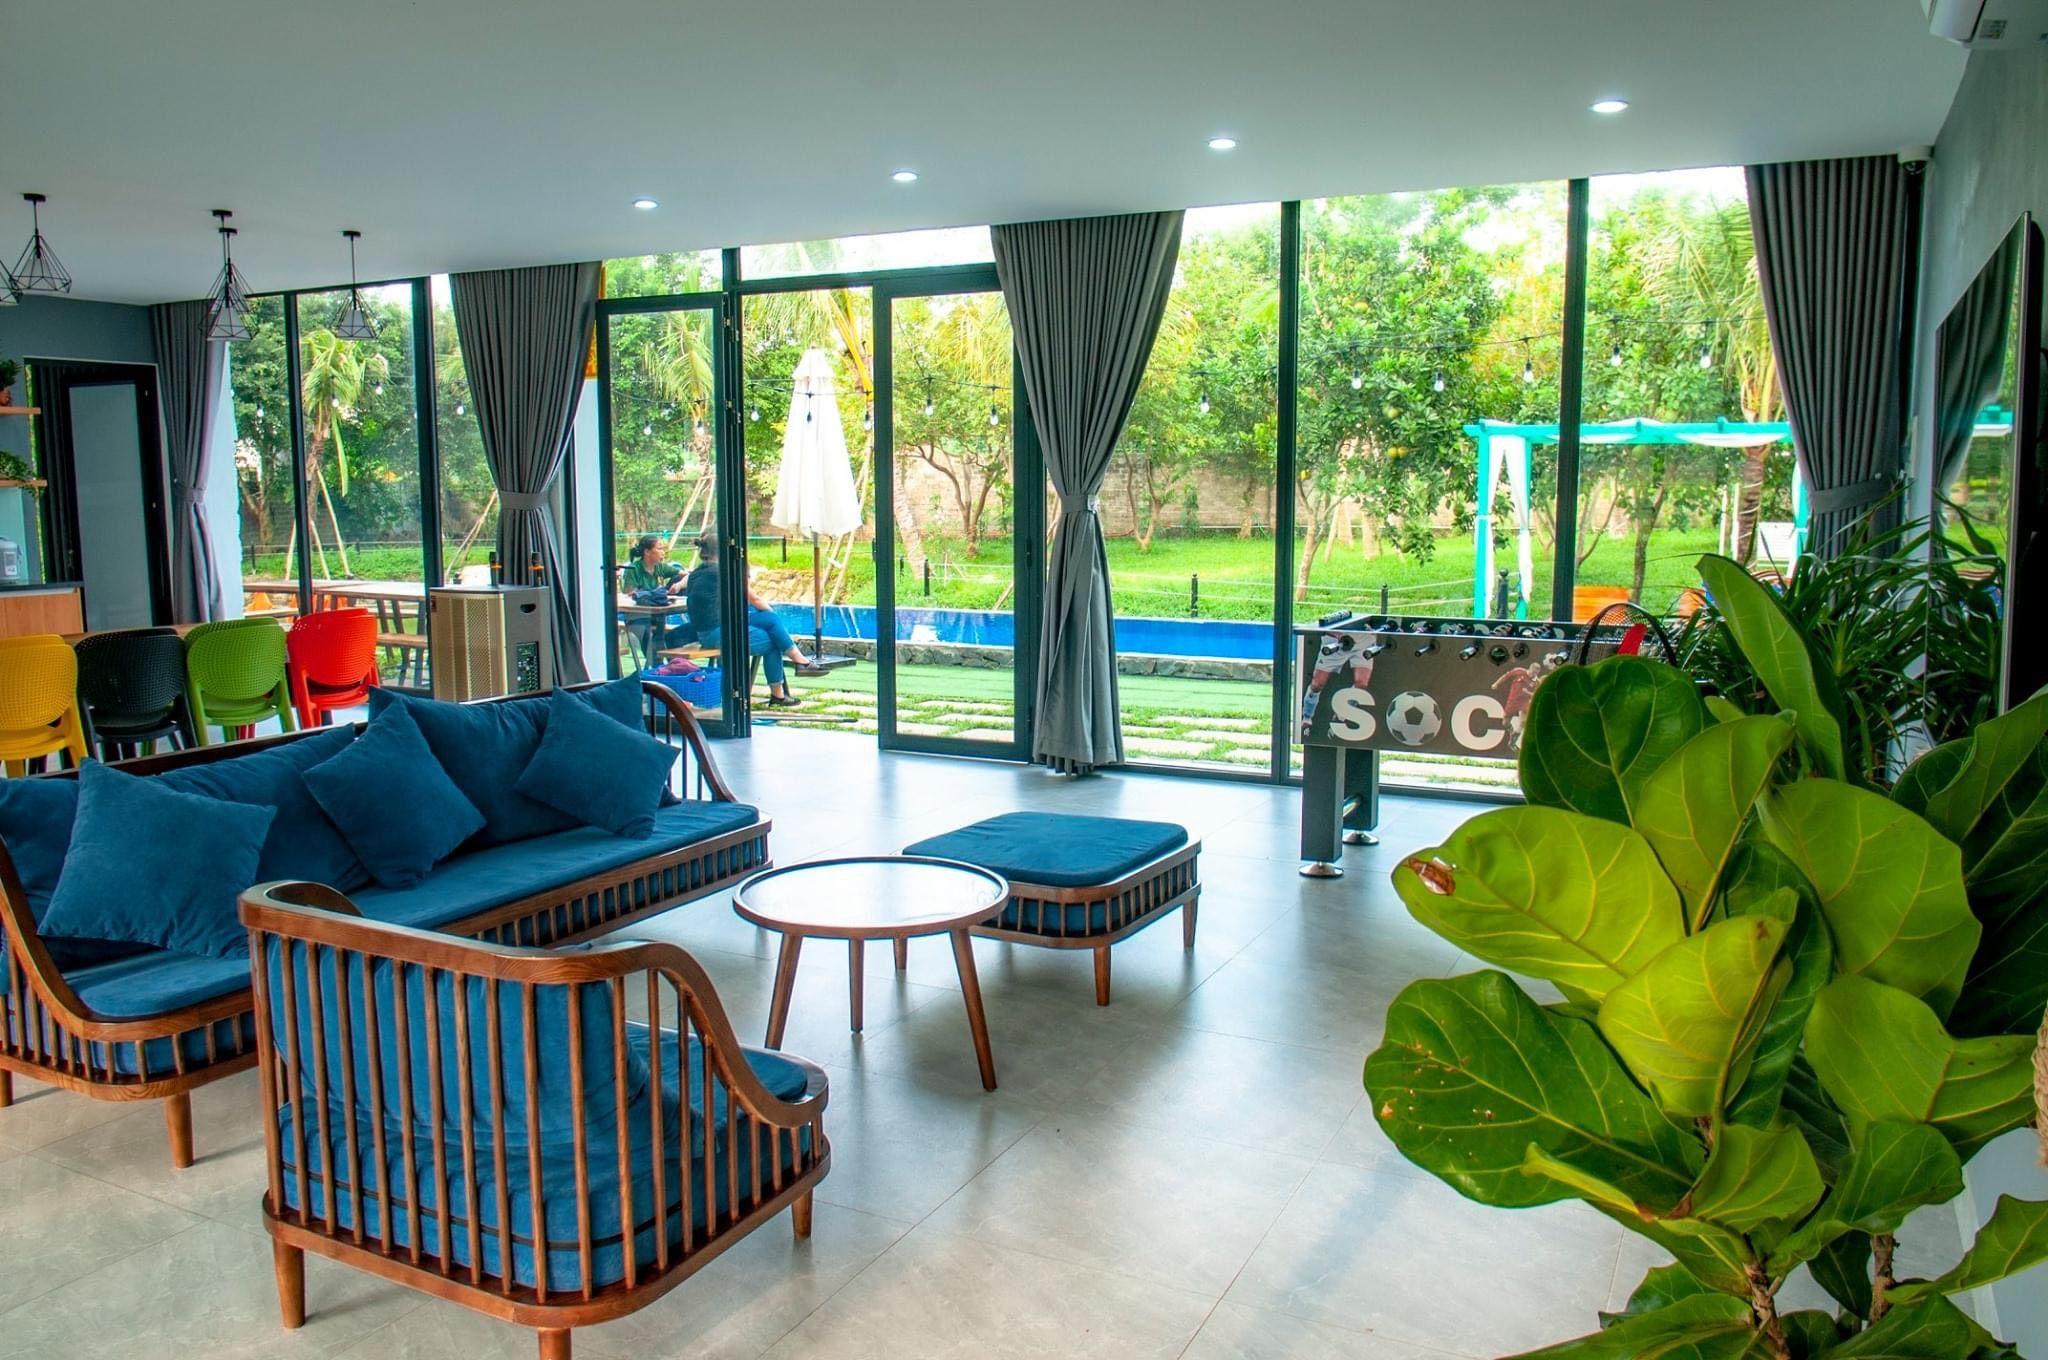 phong-khach-villa-18-tan-view-bungalow-villa-homestay-ba-vi-ha-noi-03